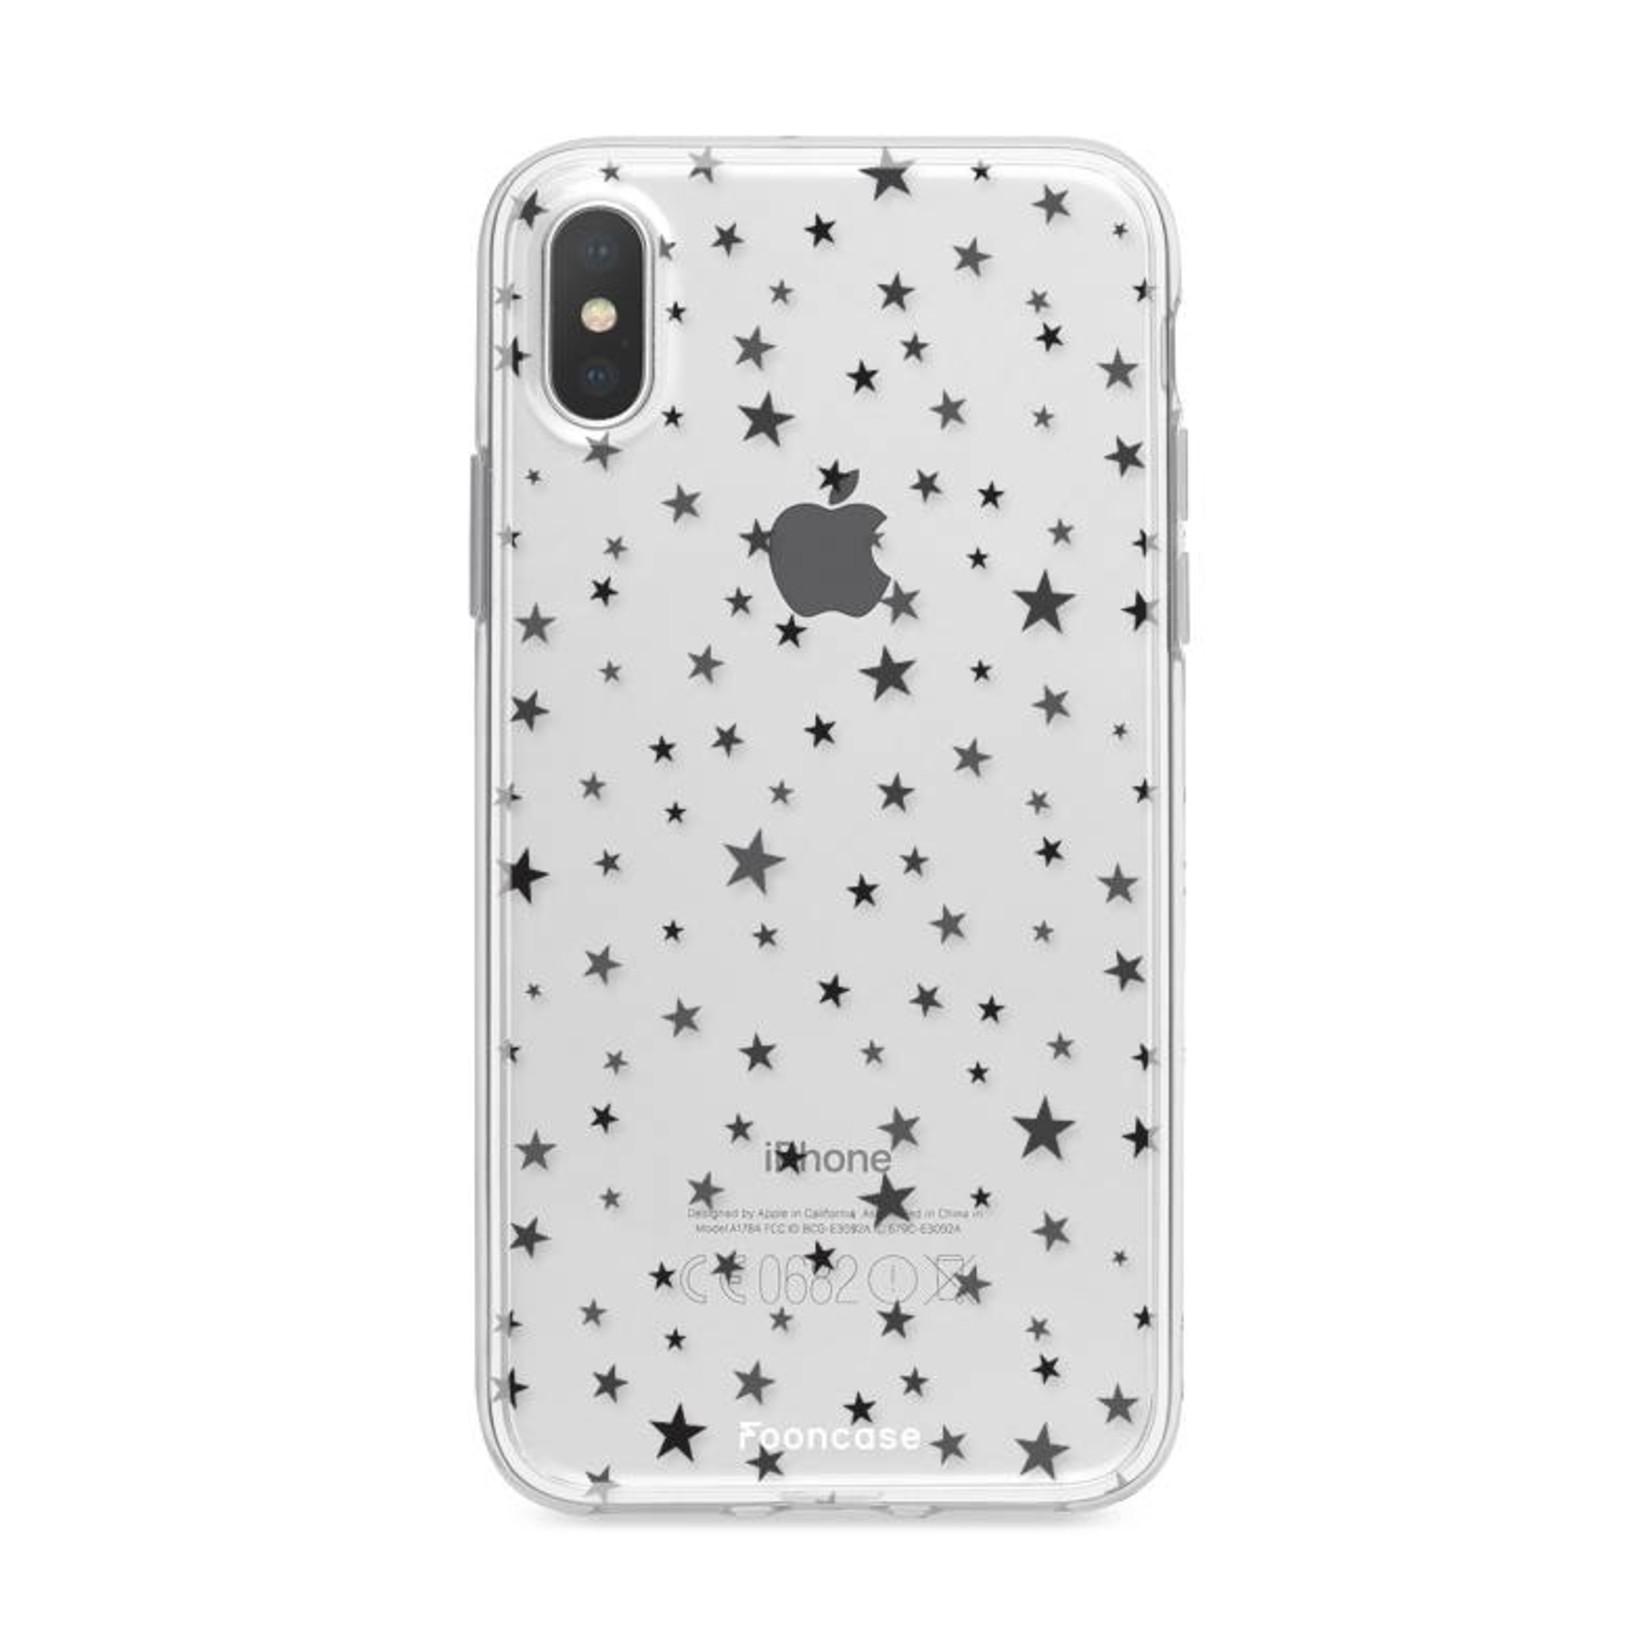 FOONCASE Iphone X Handyhülle - Sterne